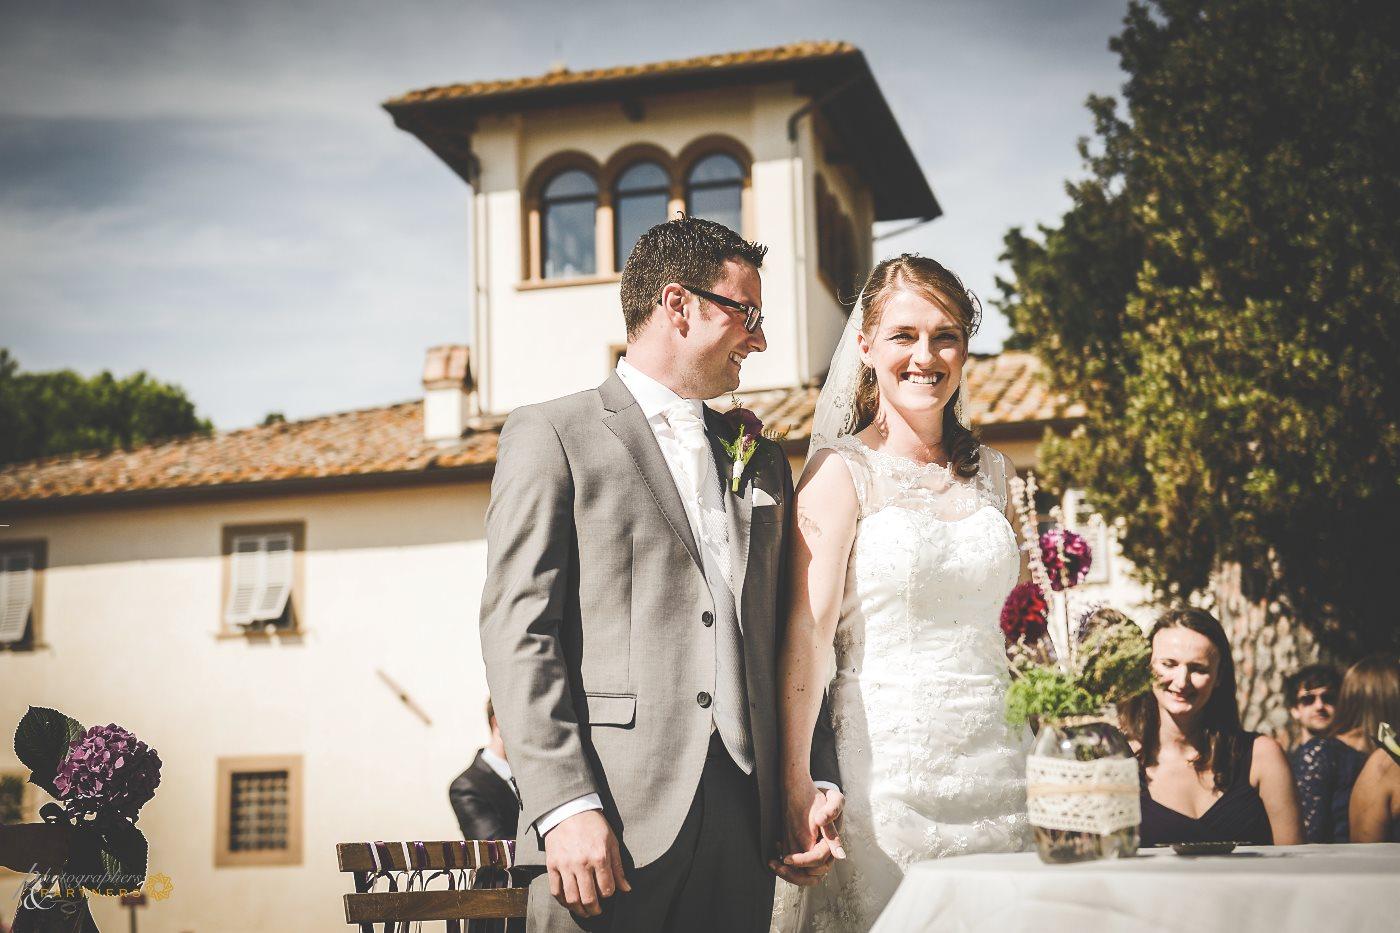 wedding_photos_sticciano_08.jpg